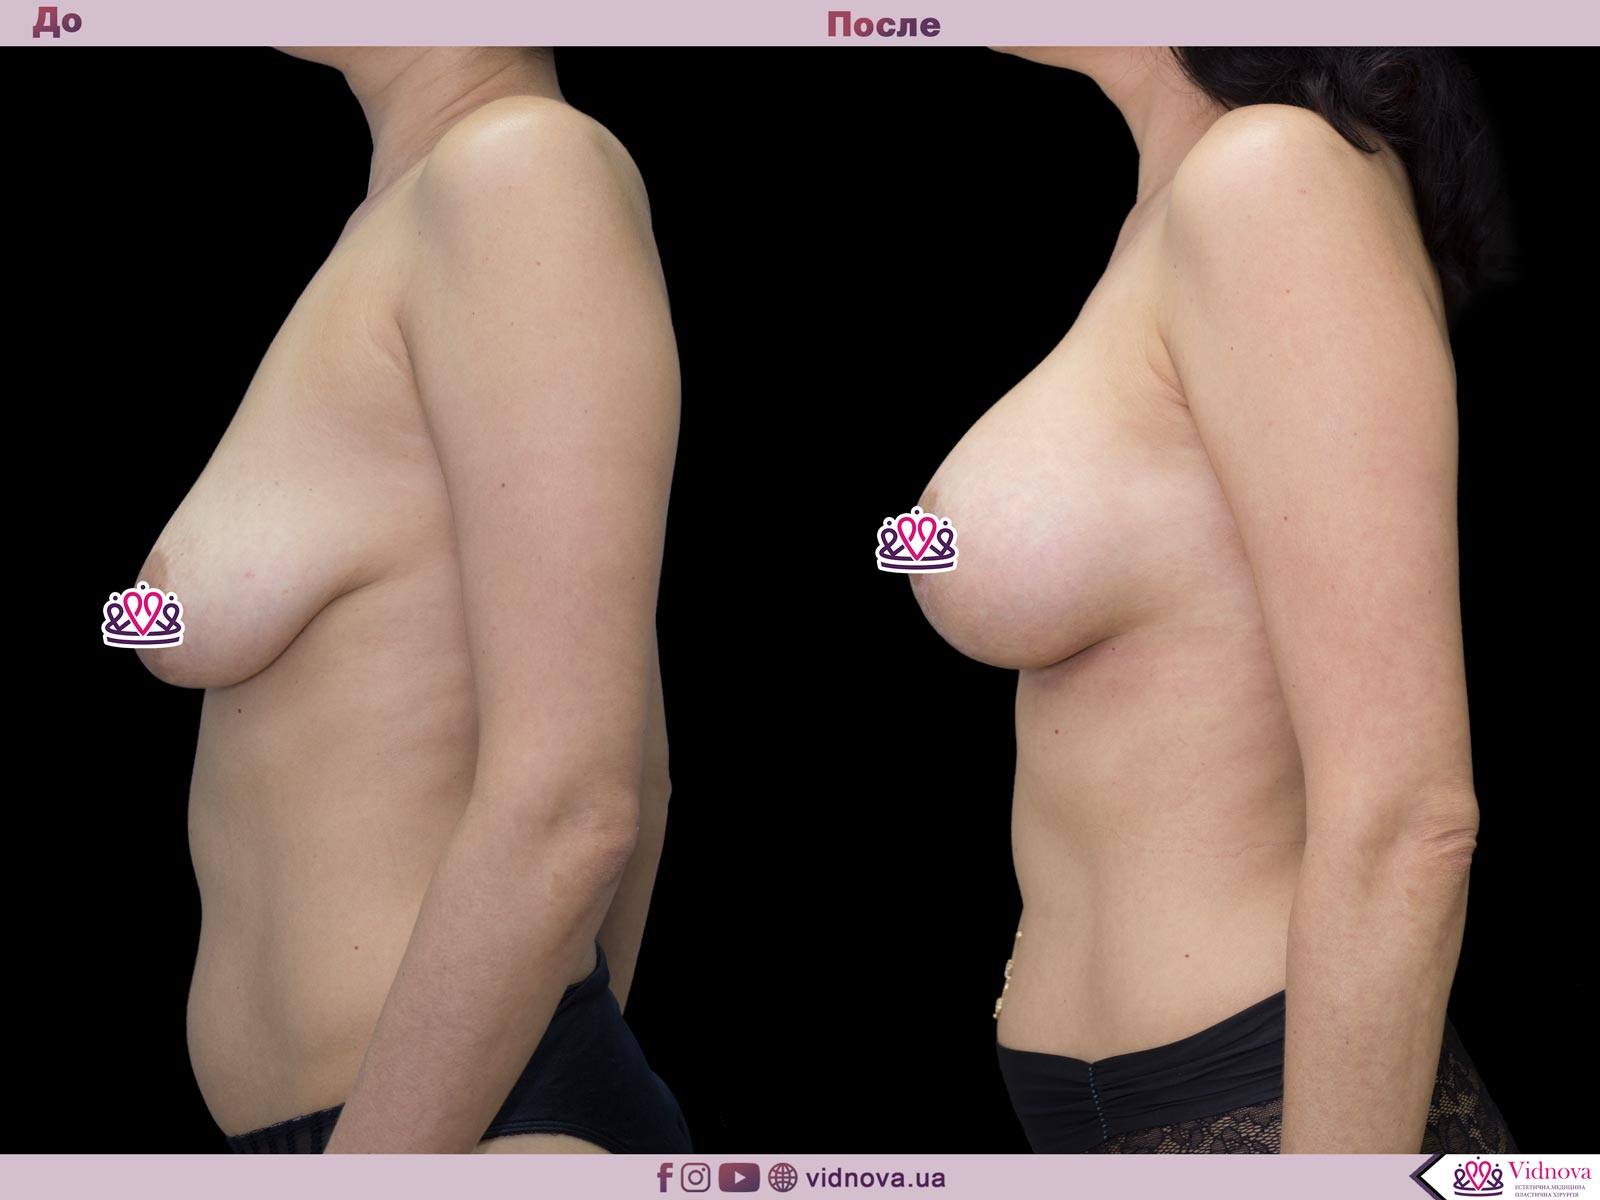 Подтяжка груди: Фото ДО и ПОСЛЕ - Пример №22-3 - Клиника Vidnova